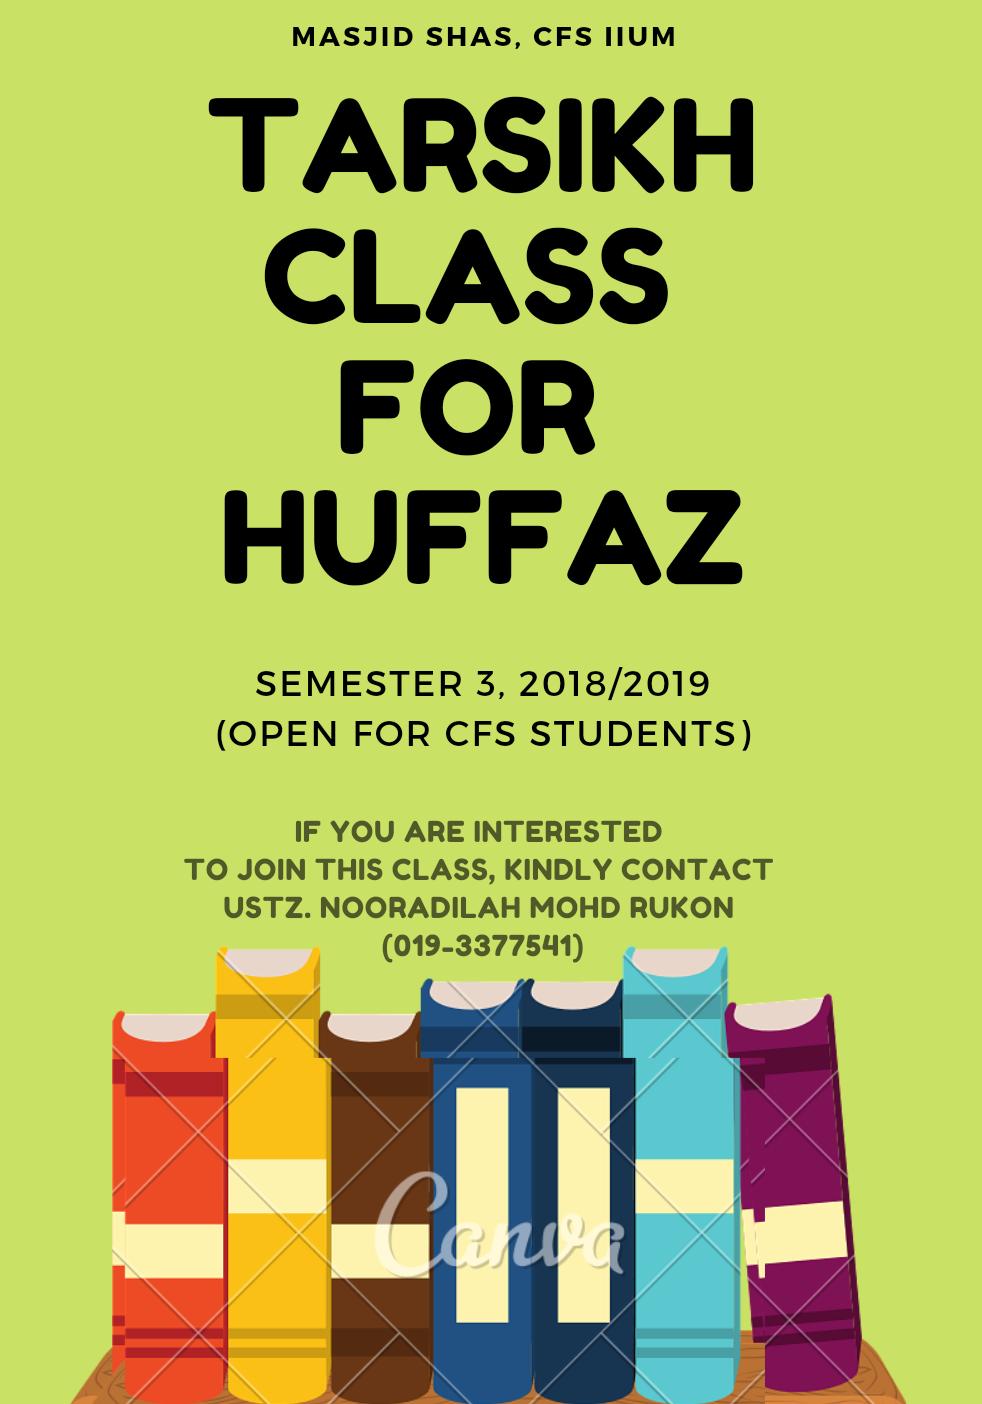 TARSIKH CLASS FOR CFS STUDENTS SEMESTER 3, 2018/2019